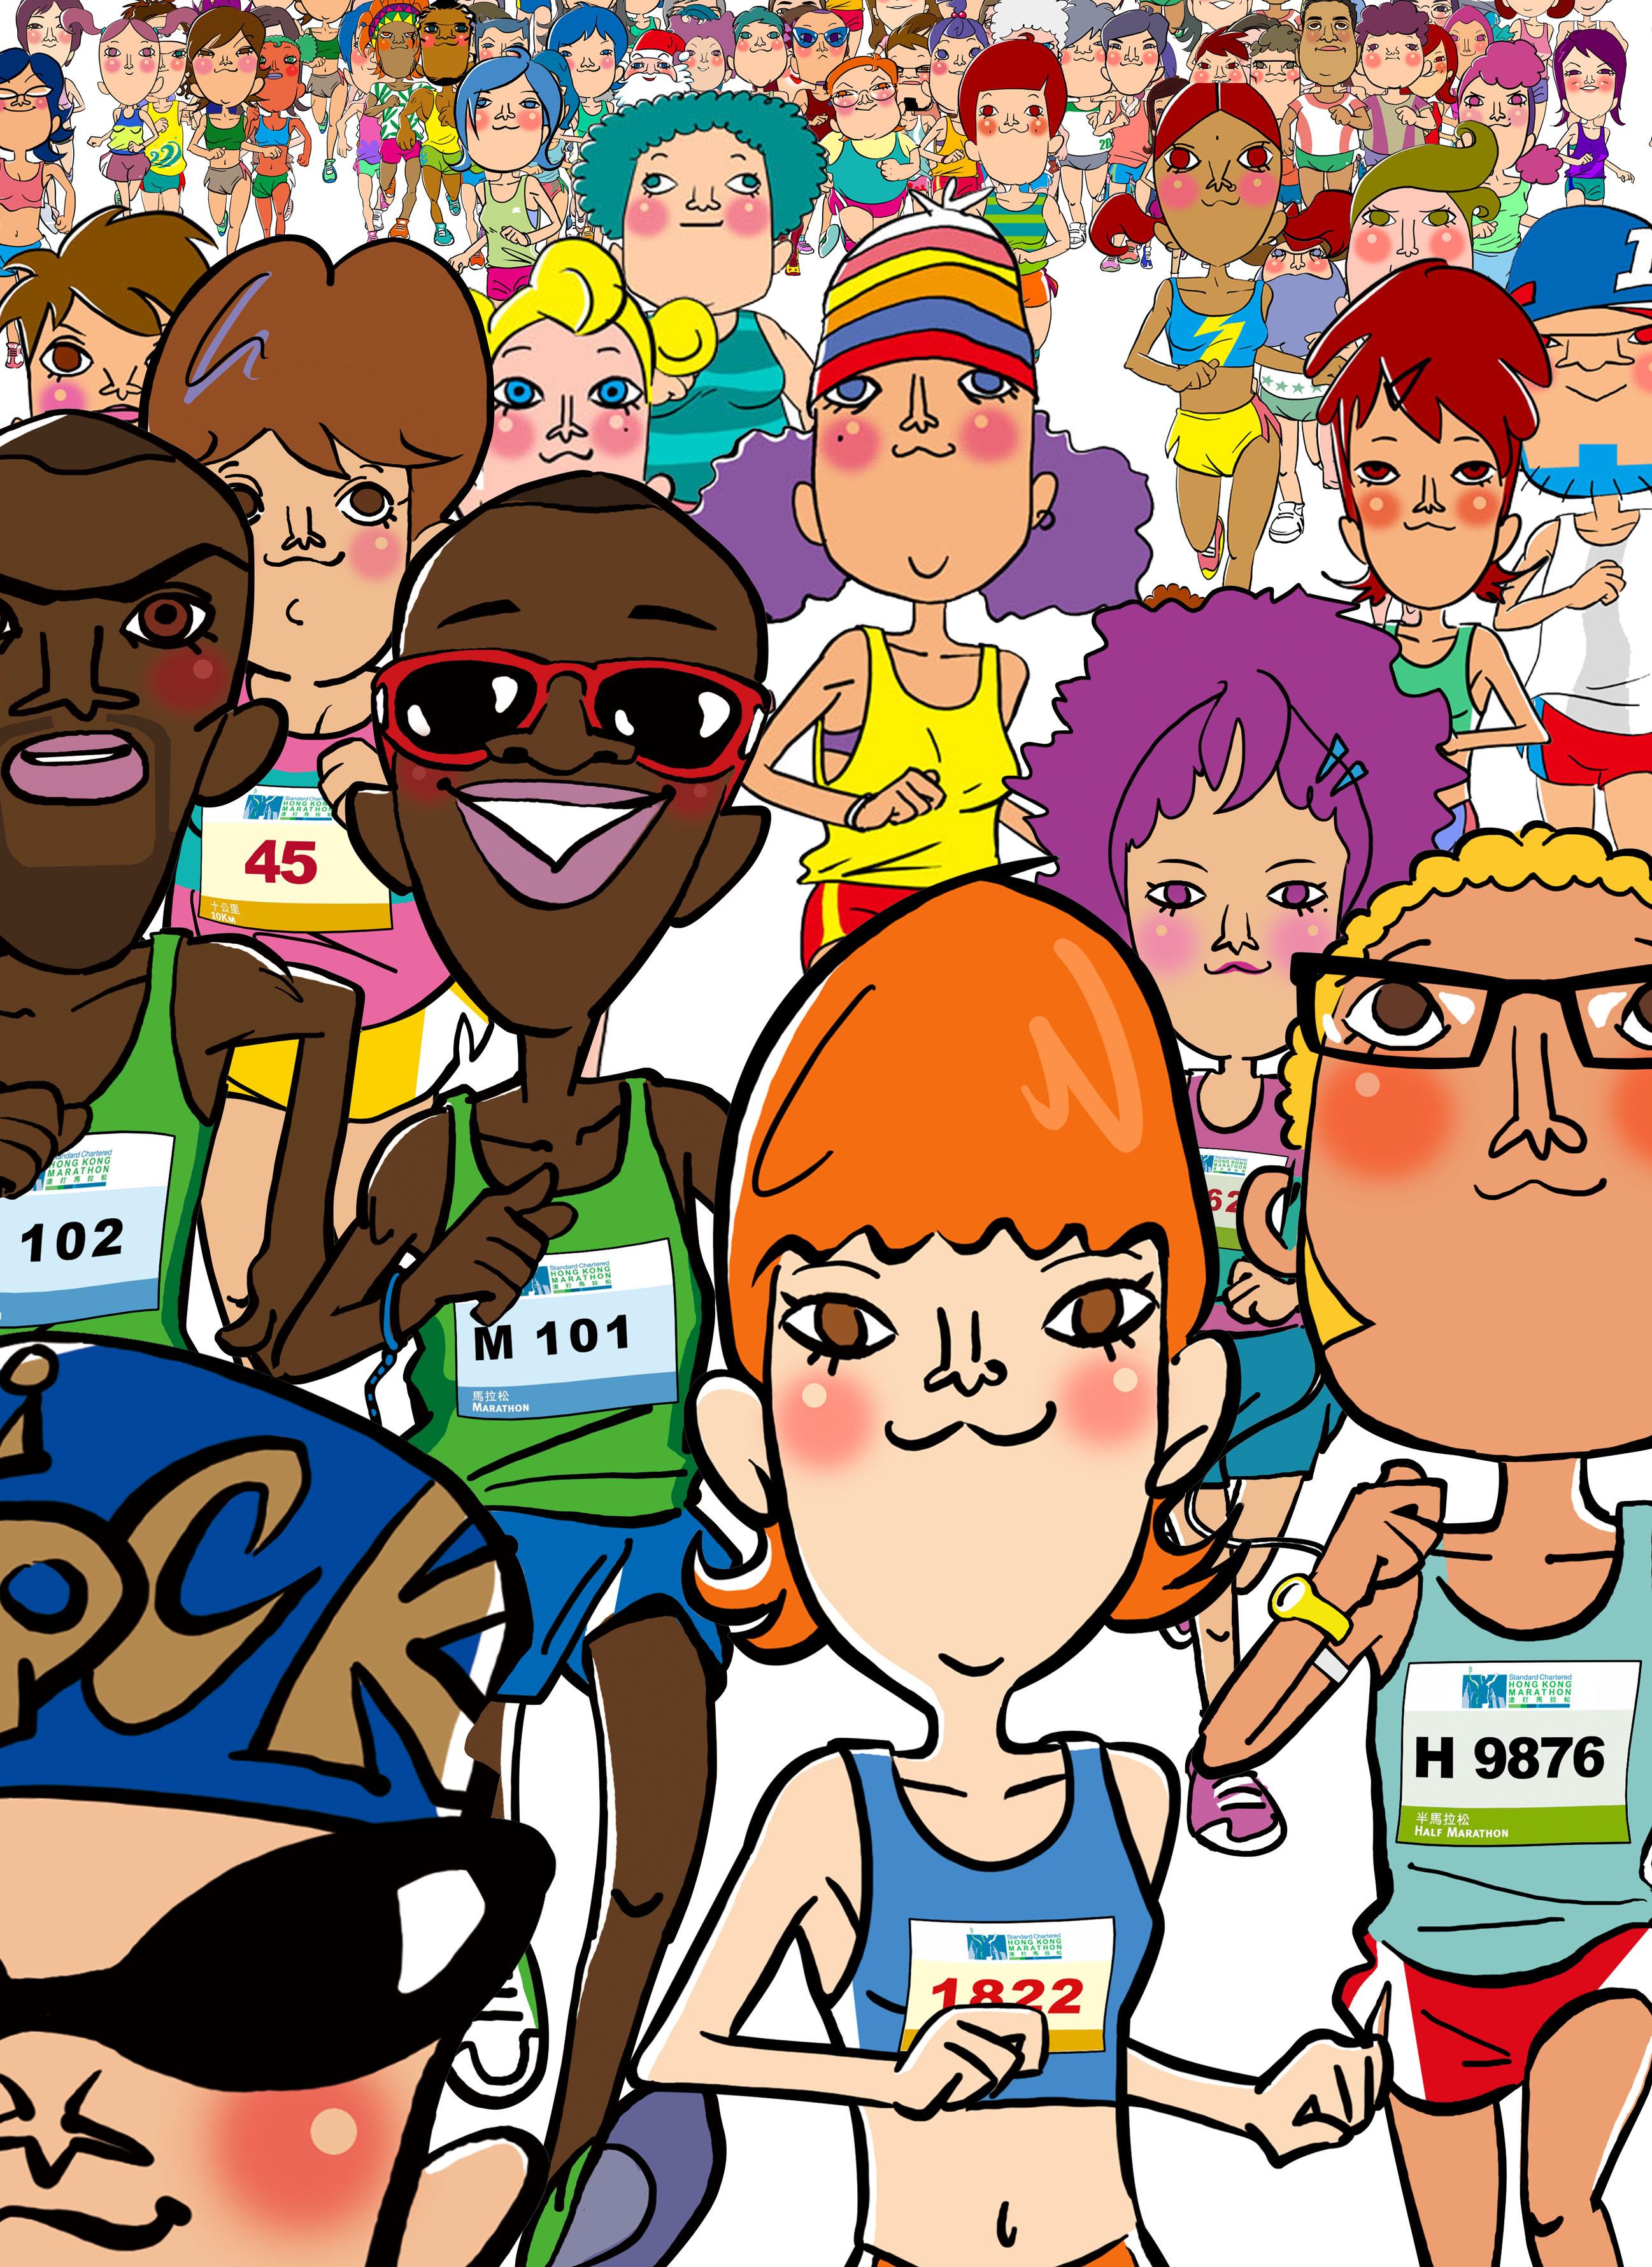 Marathon 101 poster